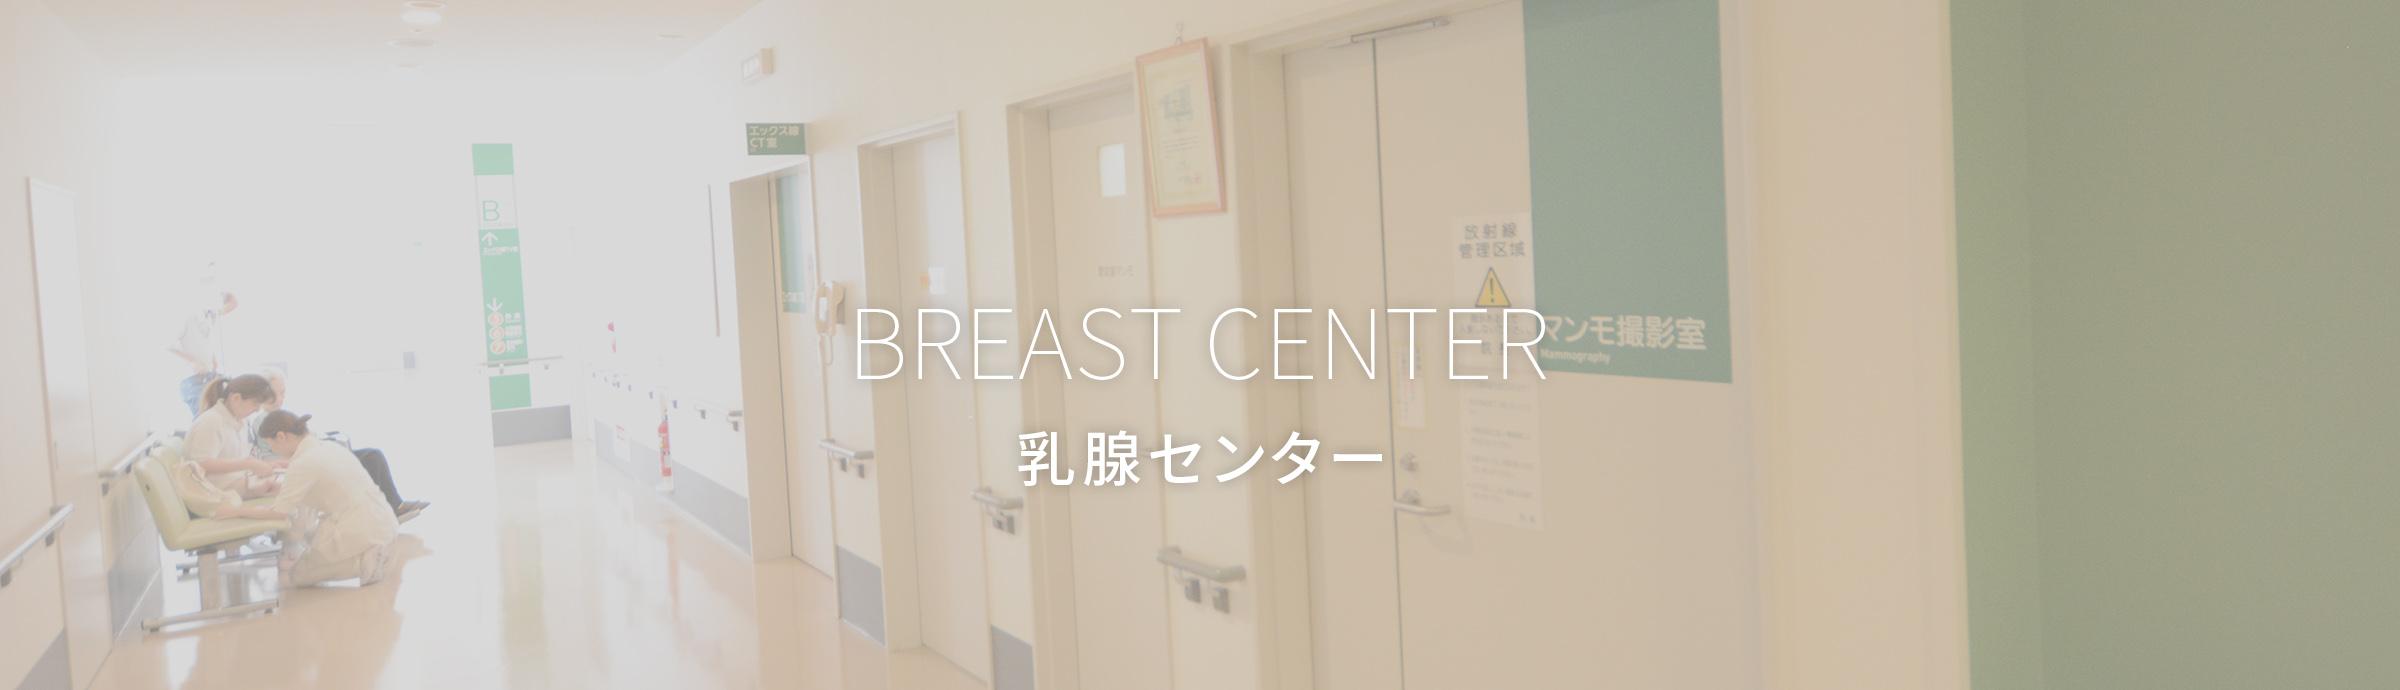 BREAST CENTER 乳腺センター